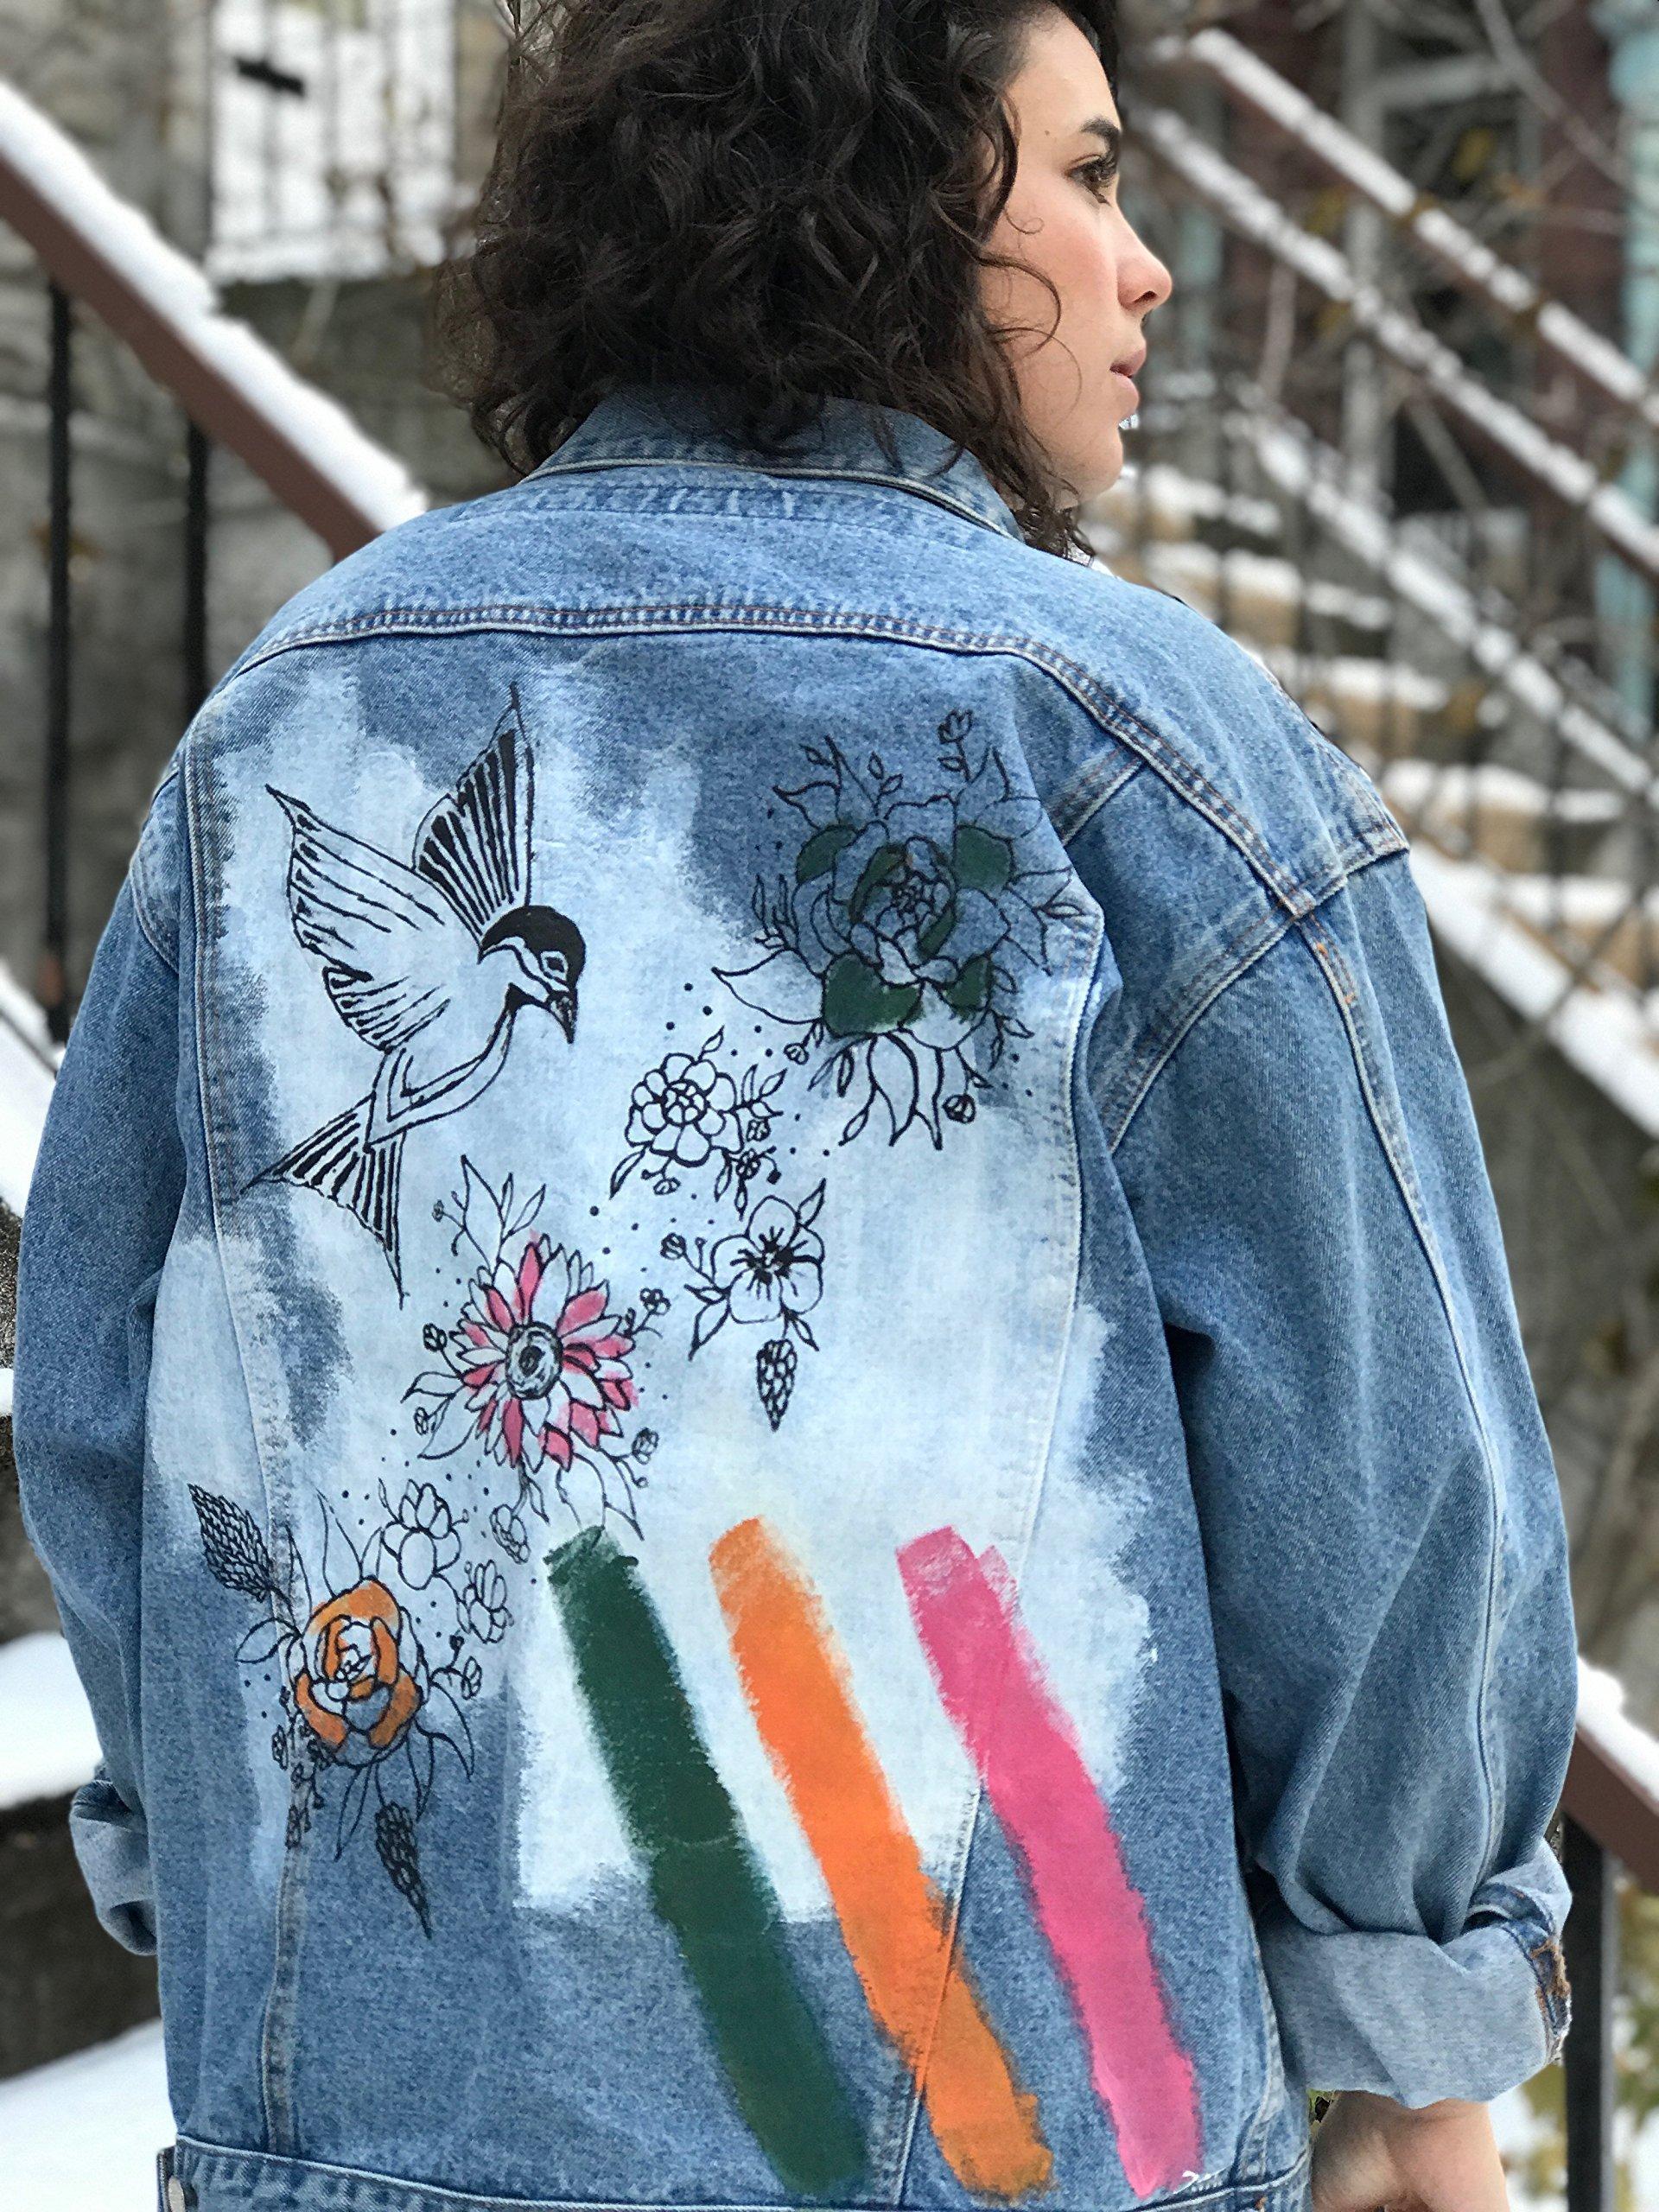 Women's Hand Painted Denim Jacket